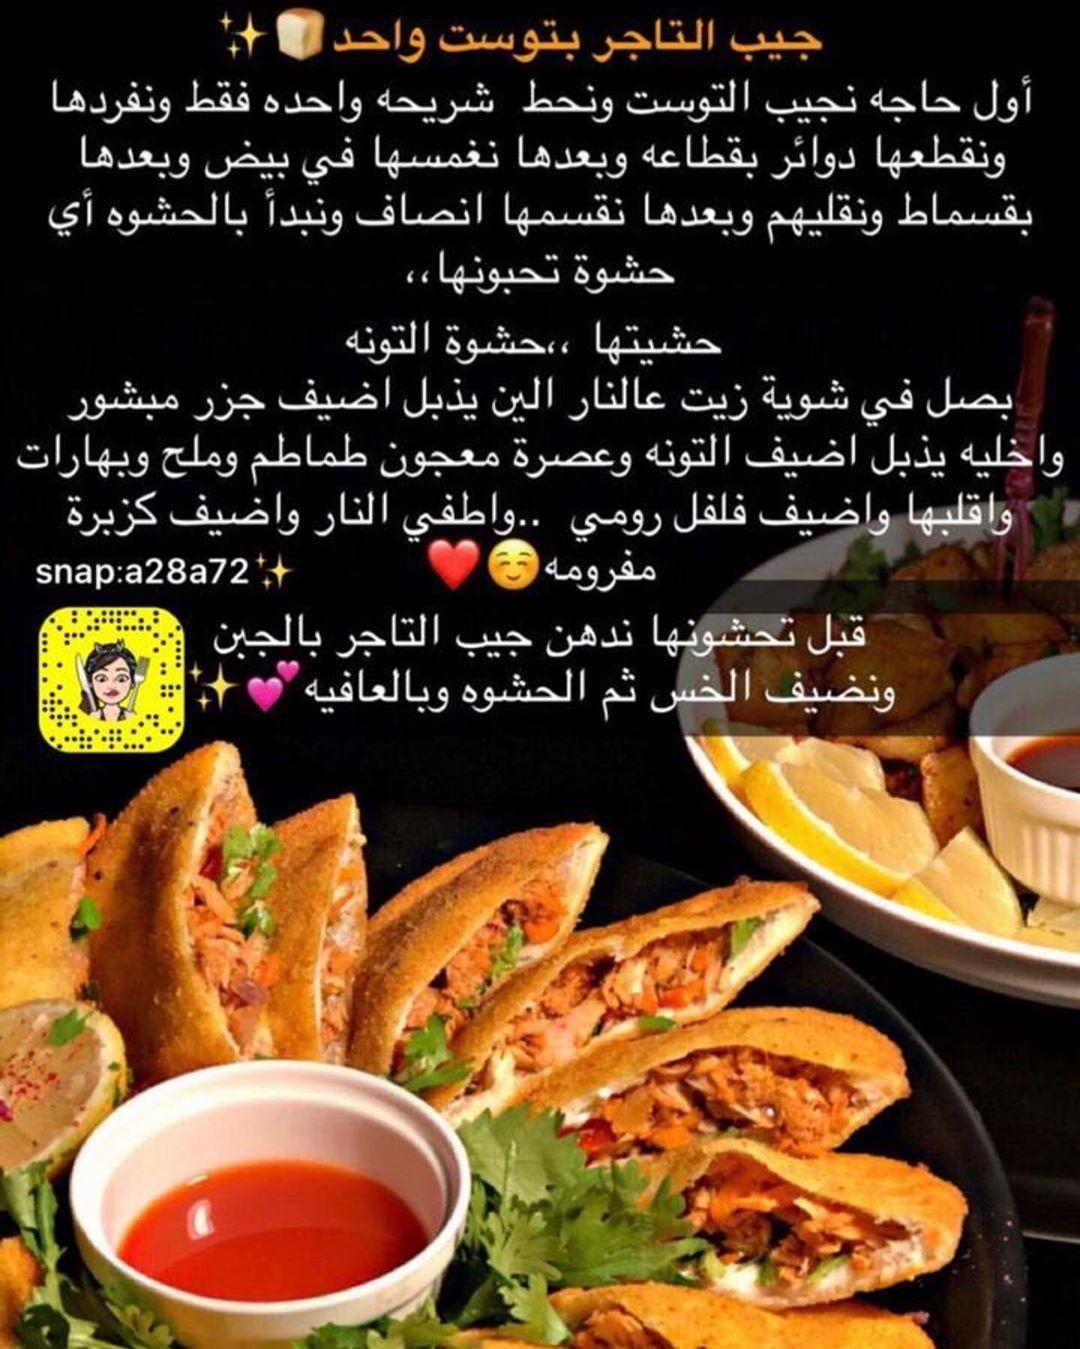 481 Likes 0 Comments الح مد لله فوق ك ل ش عور Aklat25 On Instagram وصفات منقوله Cookout Food Food Receipes Recipes